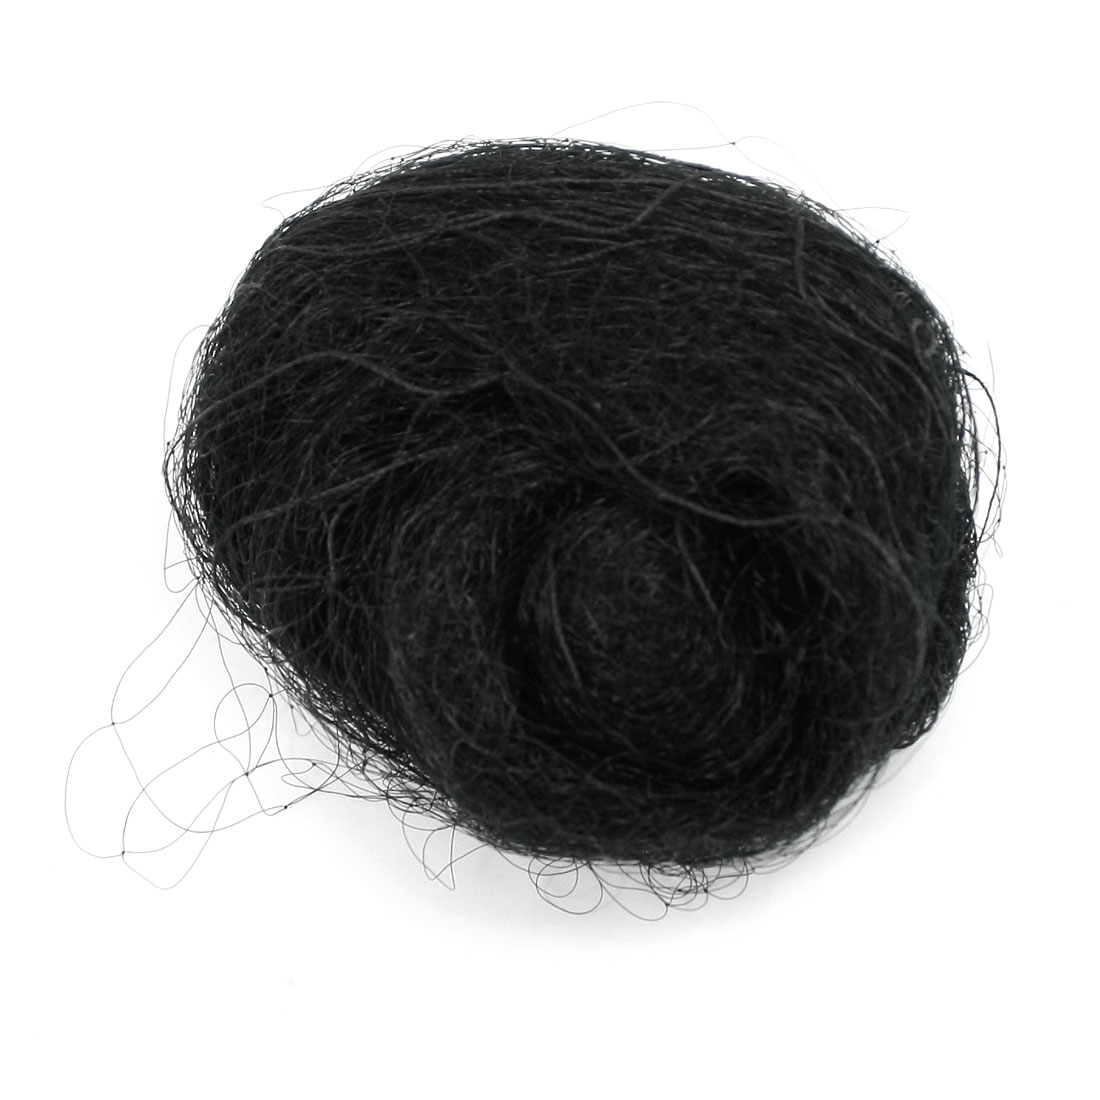 12M x 2.5M 7# Gardening Anti Bird Netting Black Nylon Knotted Mist Net